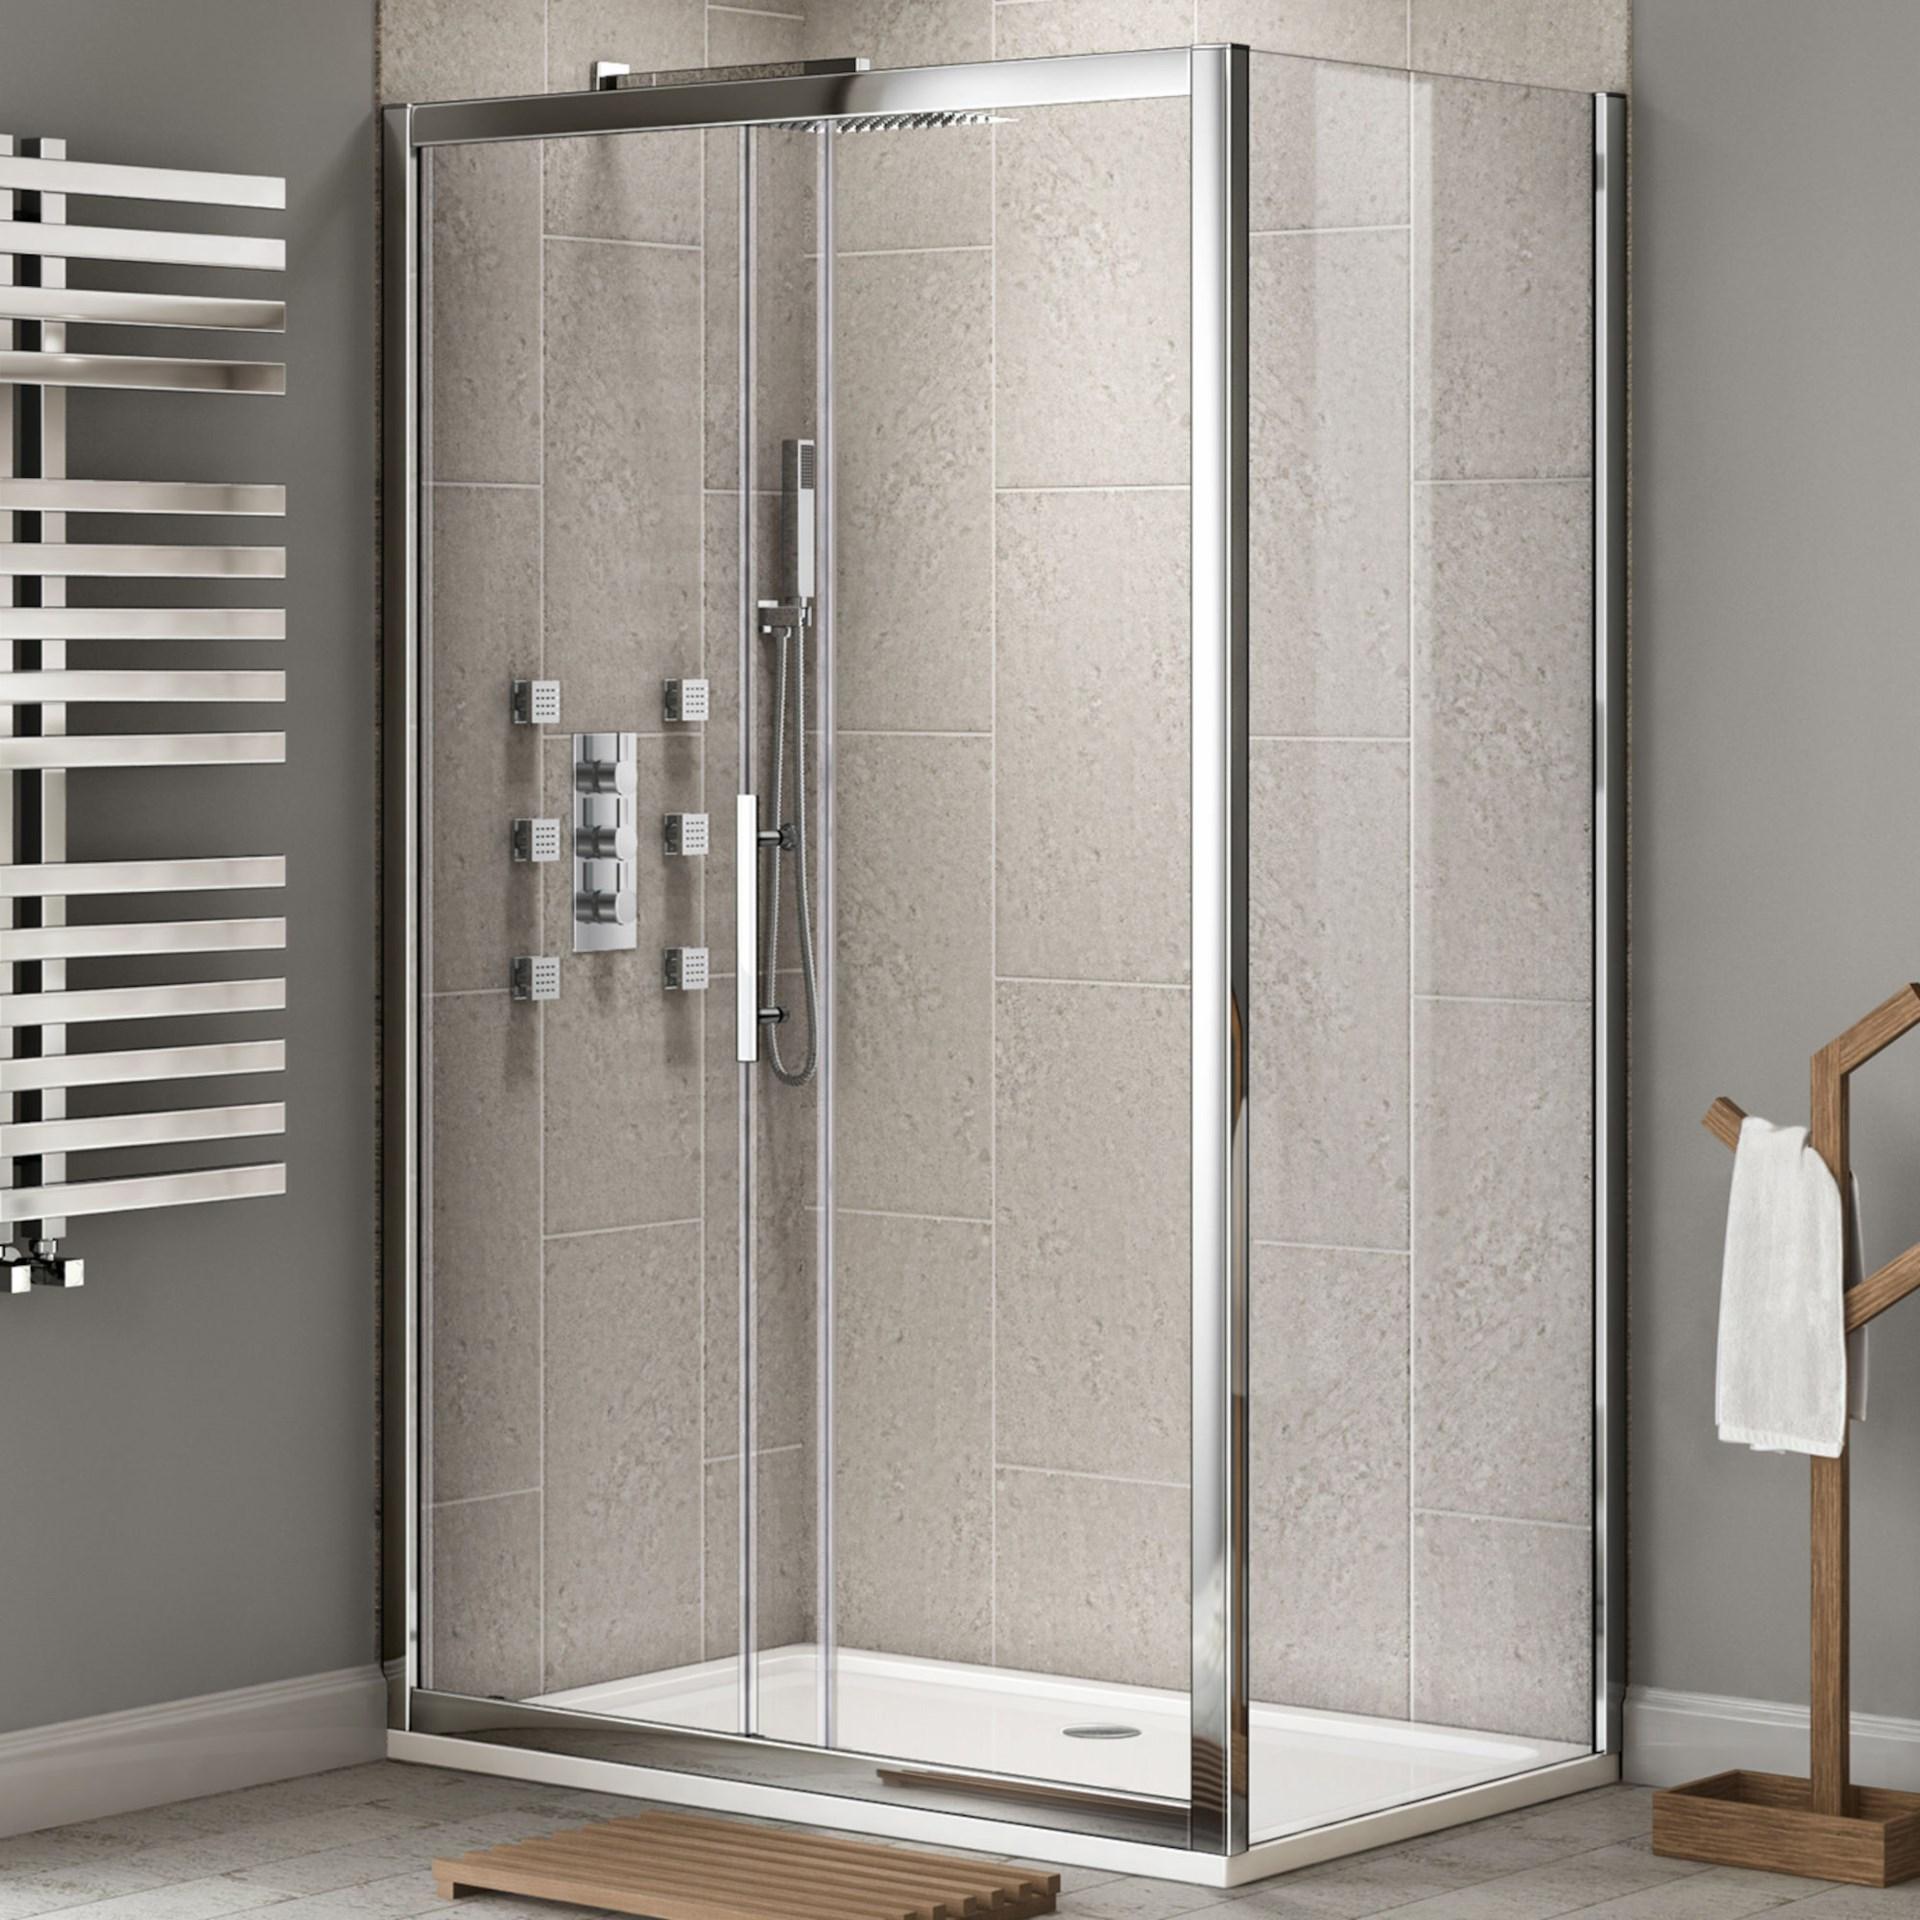 Liberty  Shower Bath 1700 Right Hand WhiteRRP £259